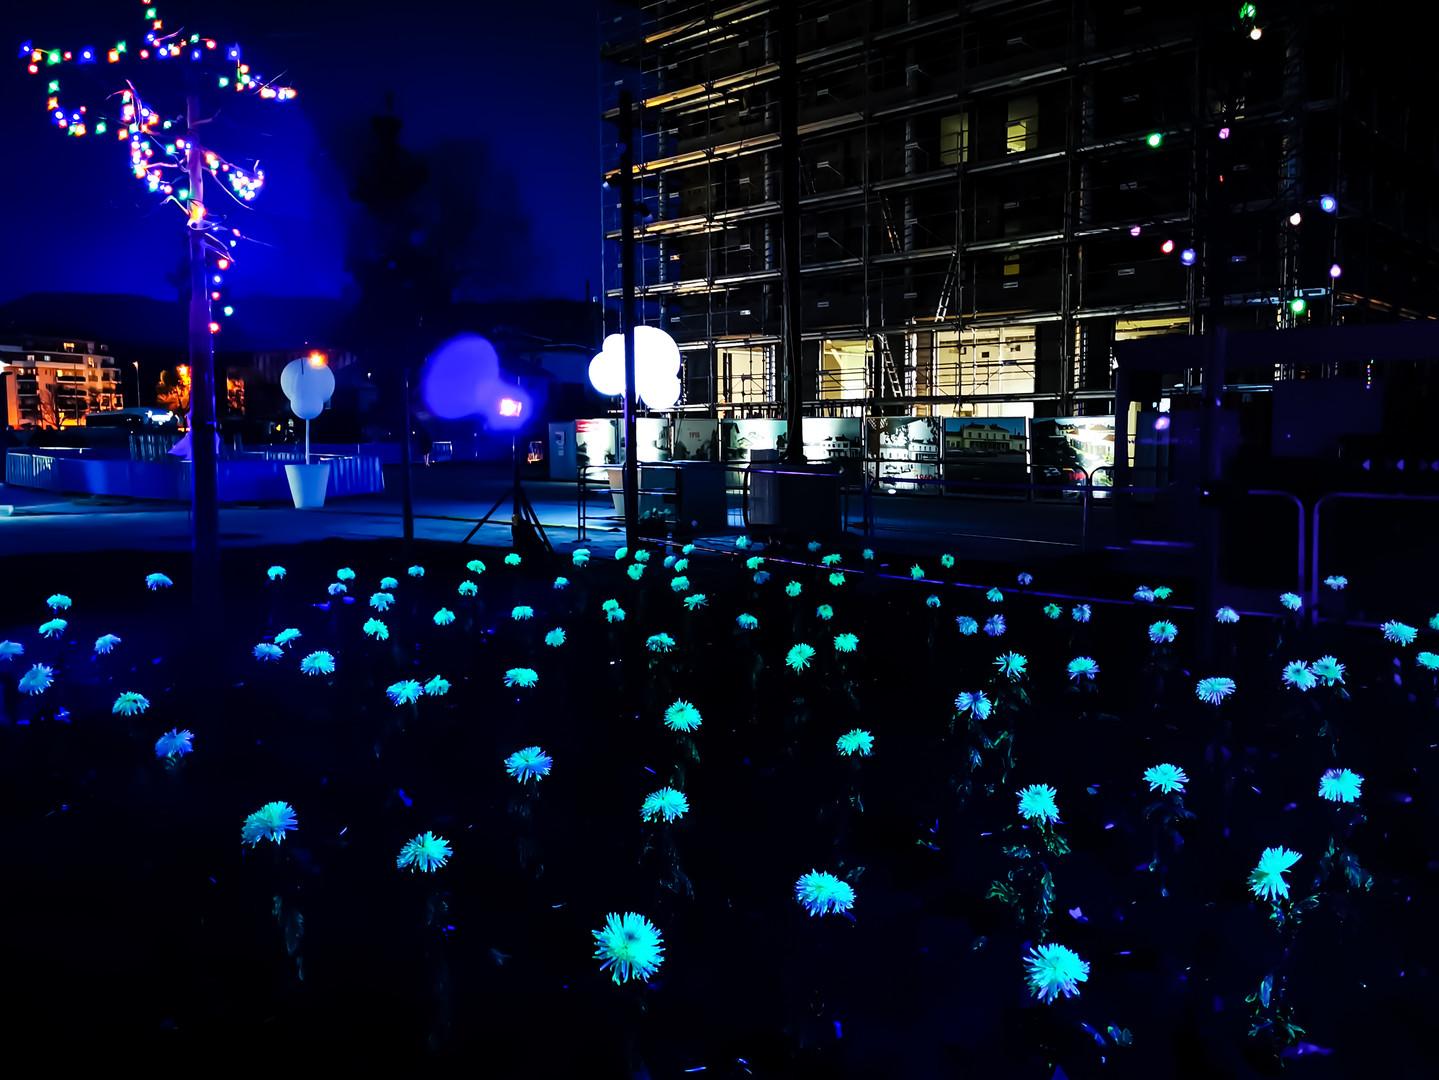 Annemasse inauguration Fleur luminescent